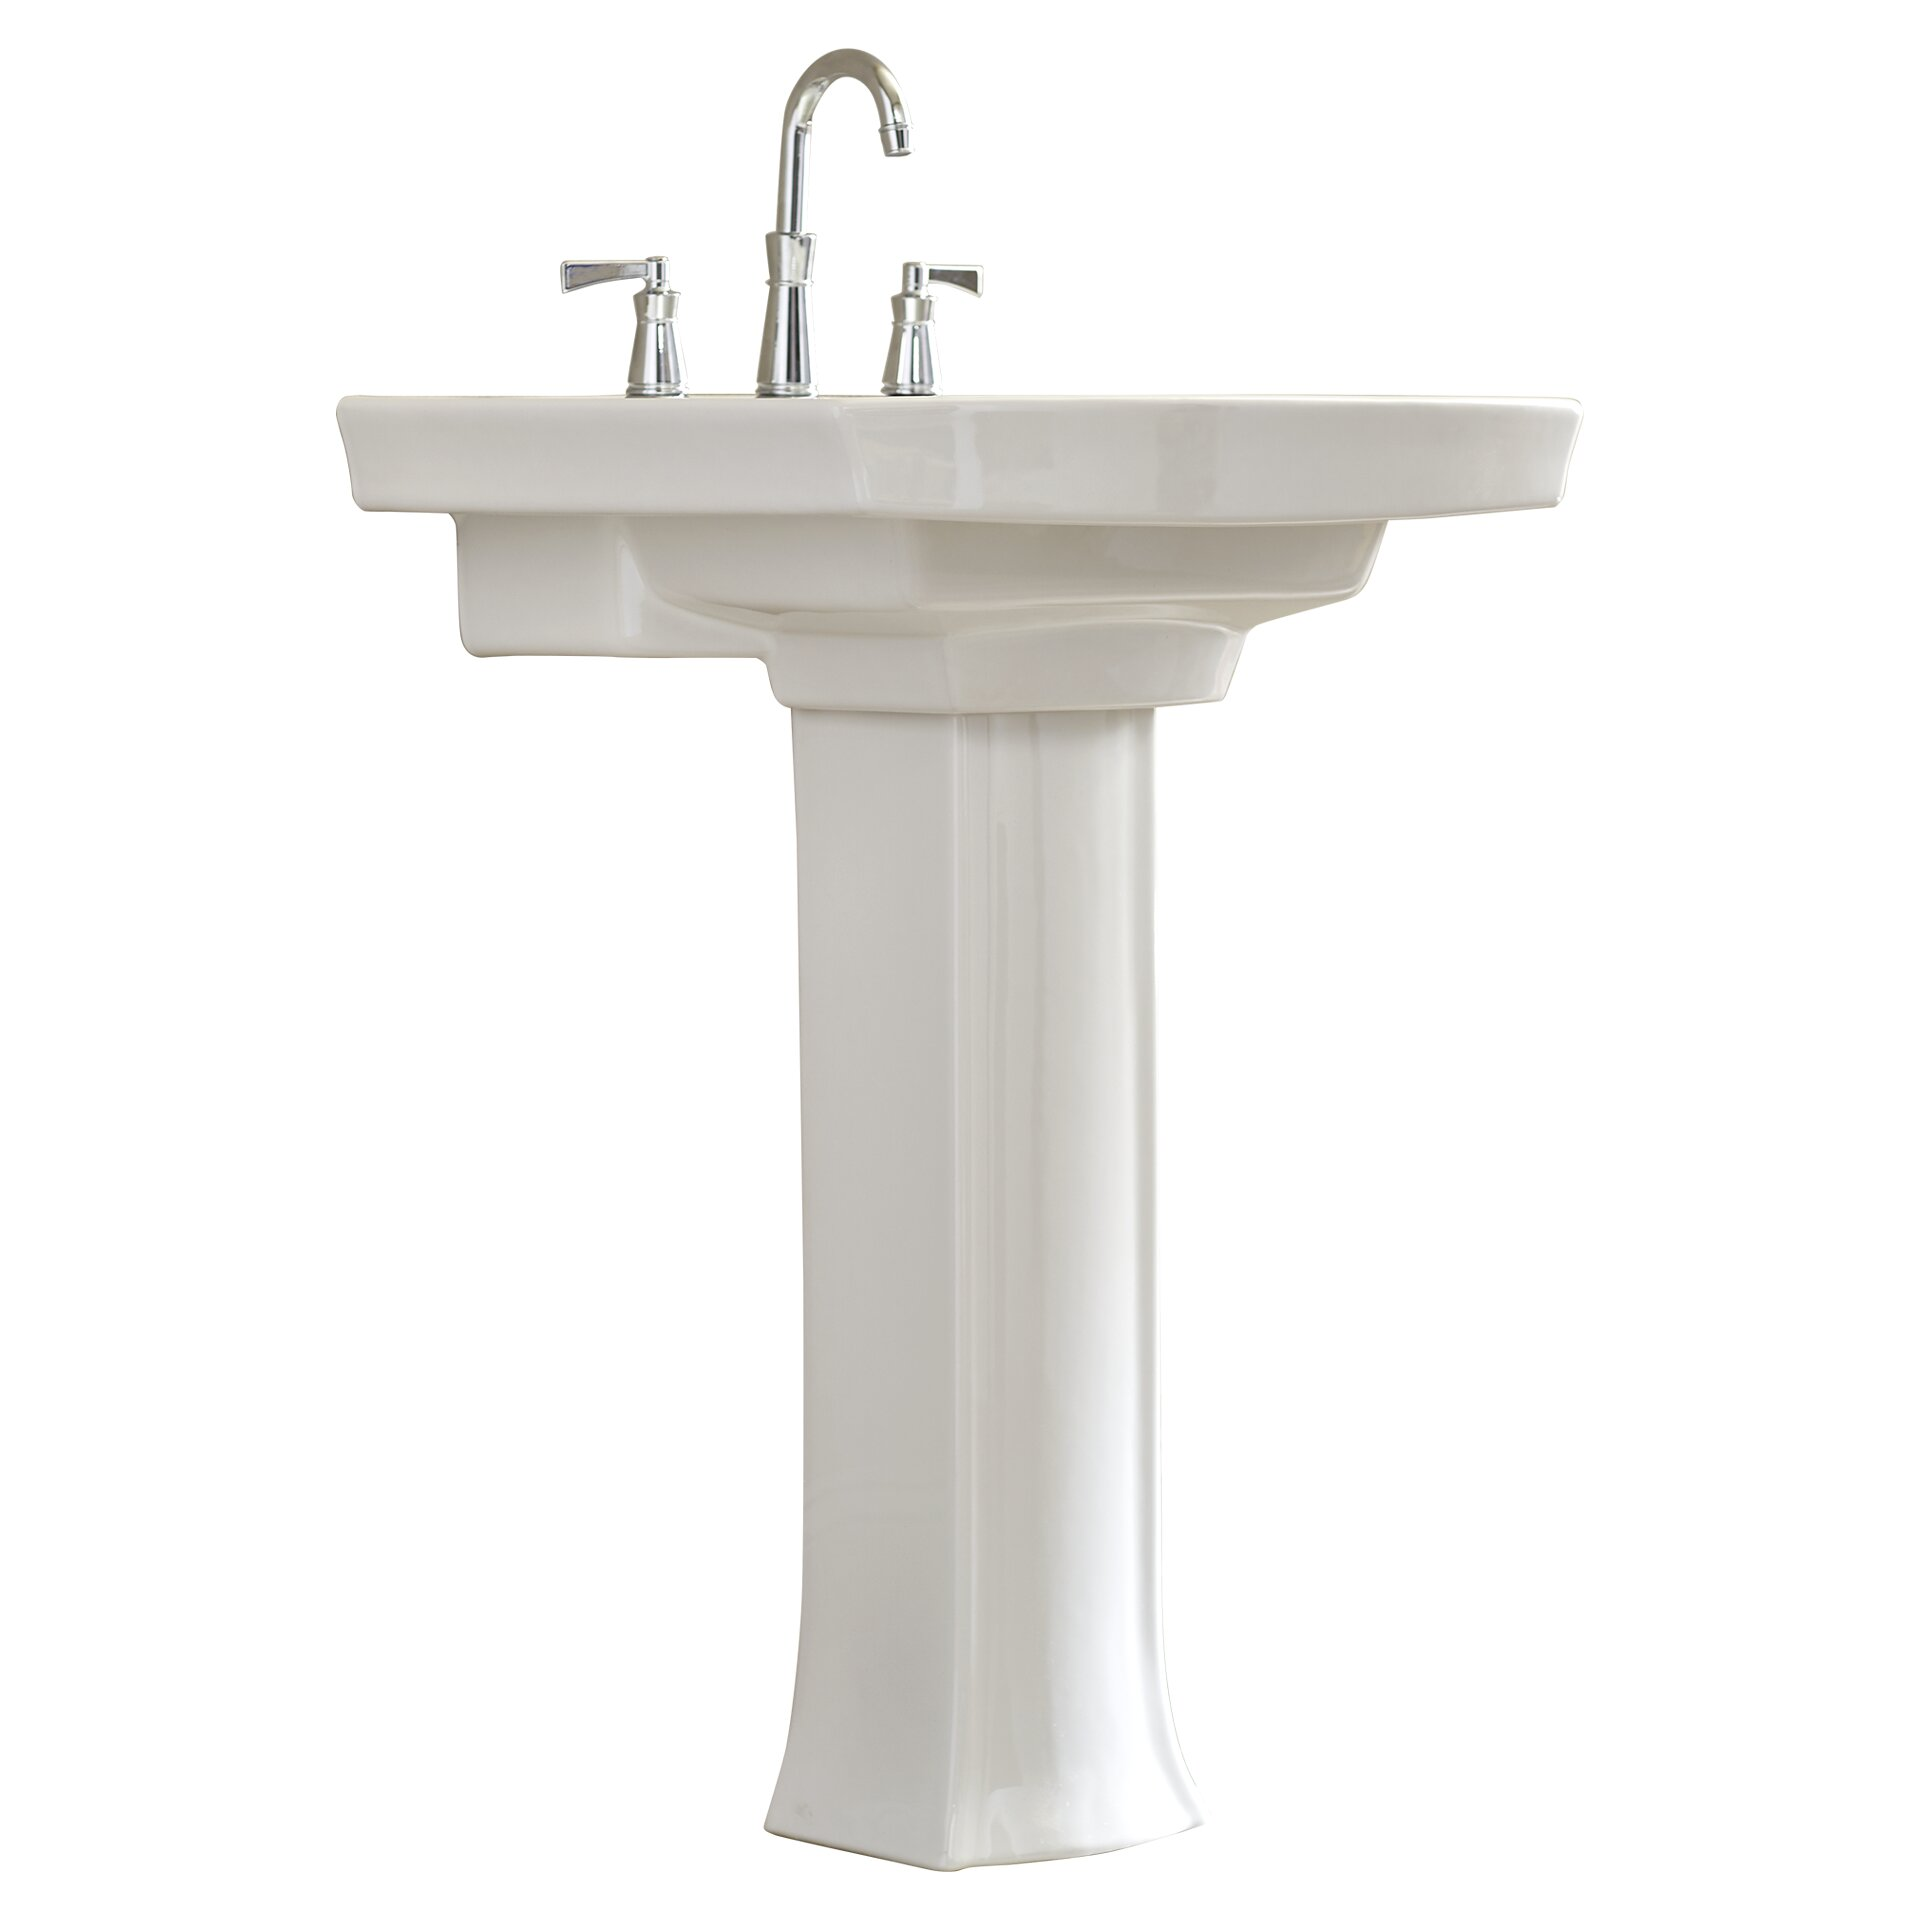 Kohler Kohler Archer Pedestal Sink Amp Reviews Wayfair